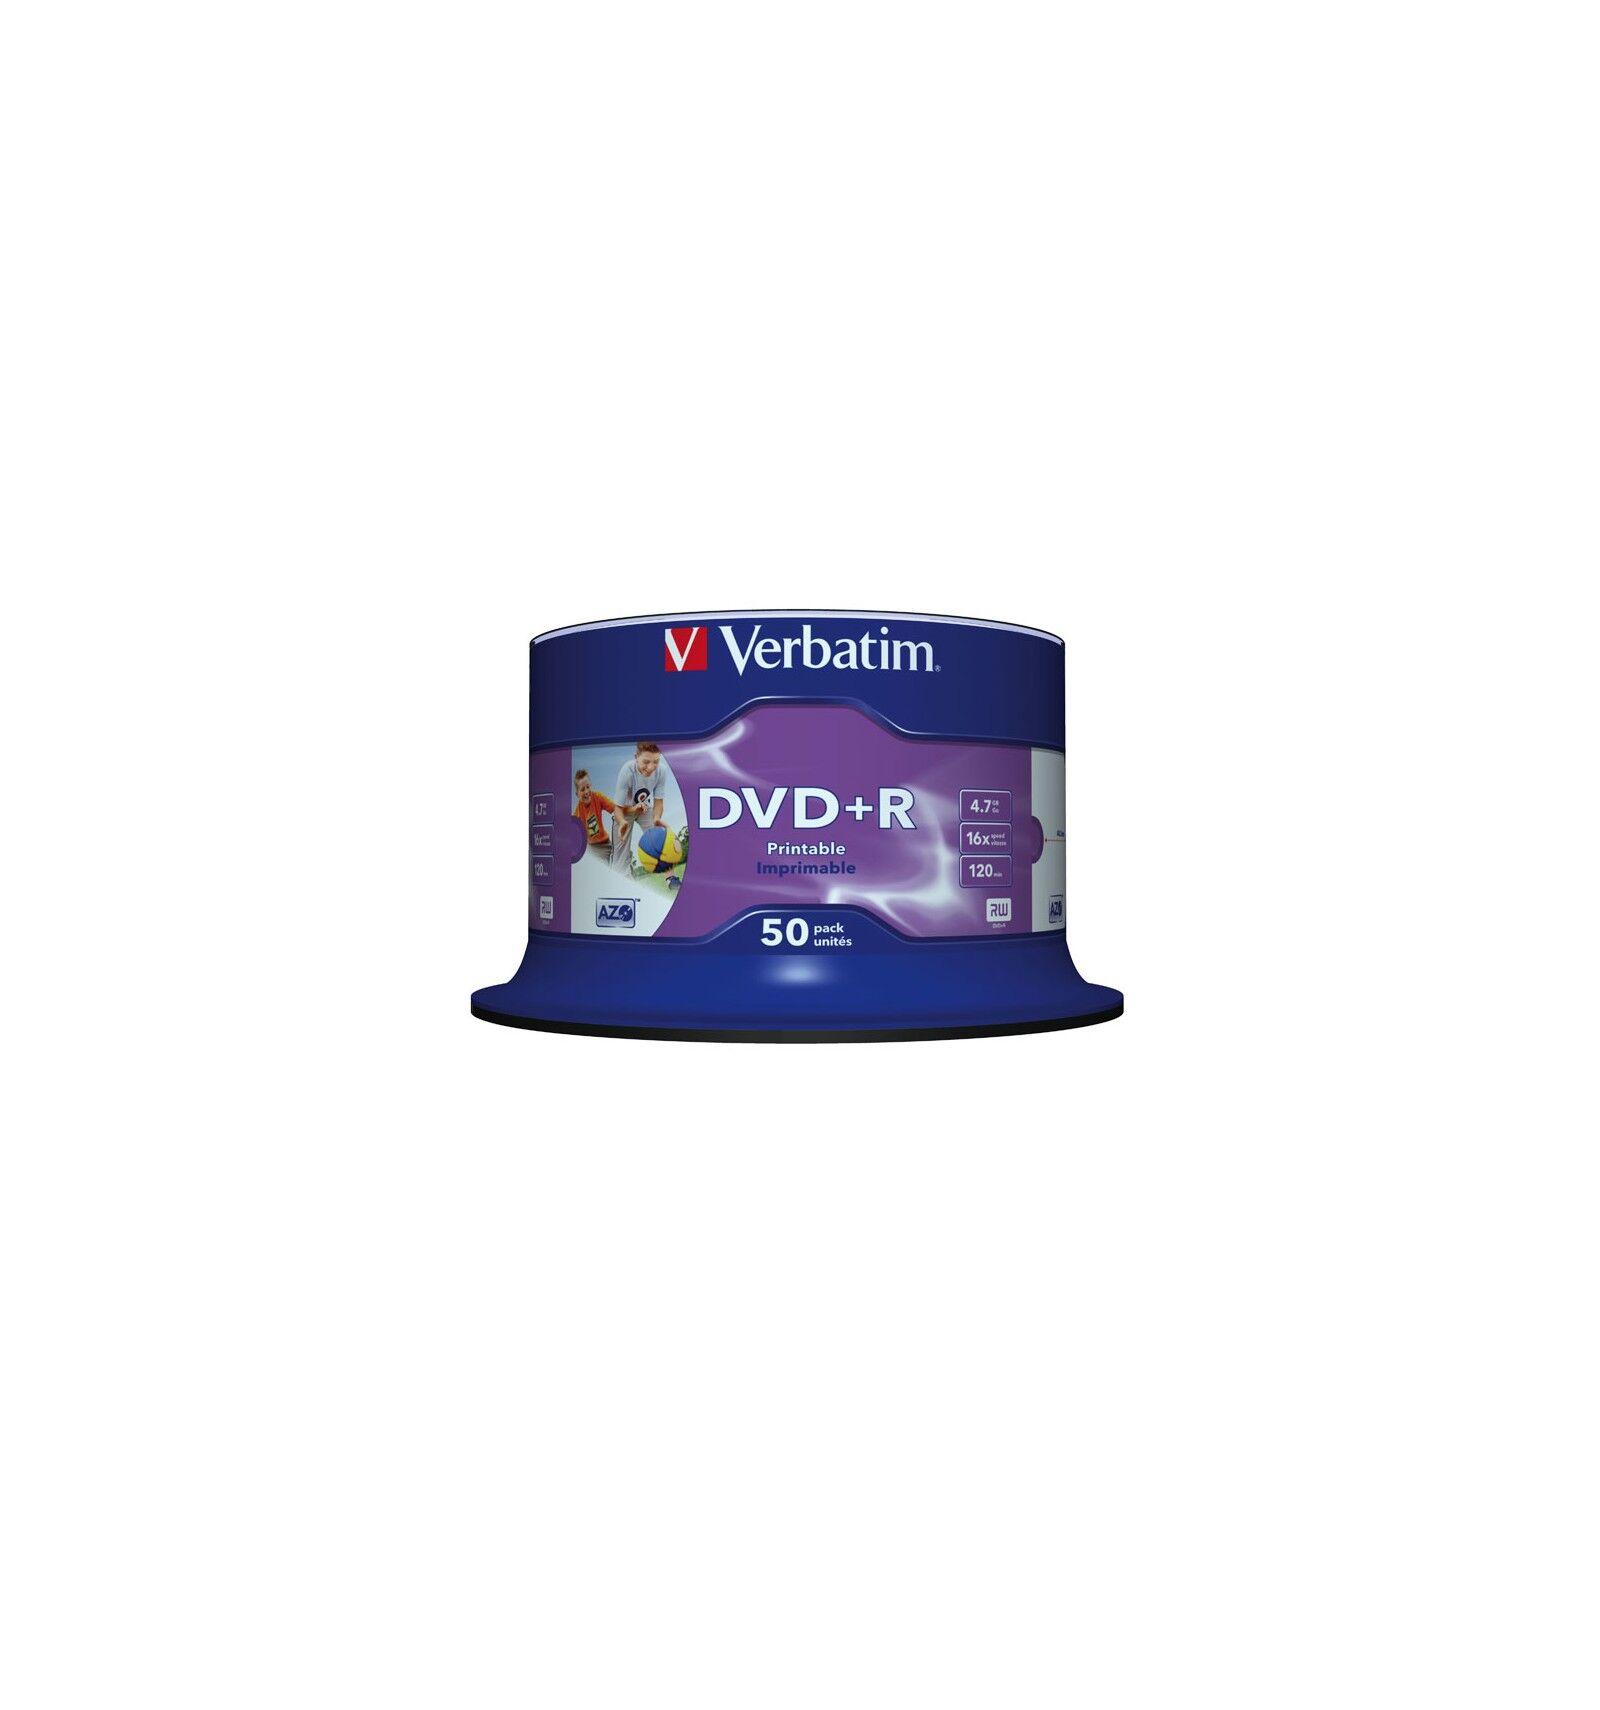 Verbatim DVD+R Wide Inkjet Printable No ID Brand 4,7 GB 50 kpl